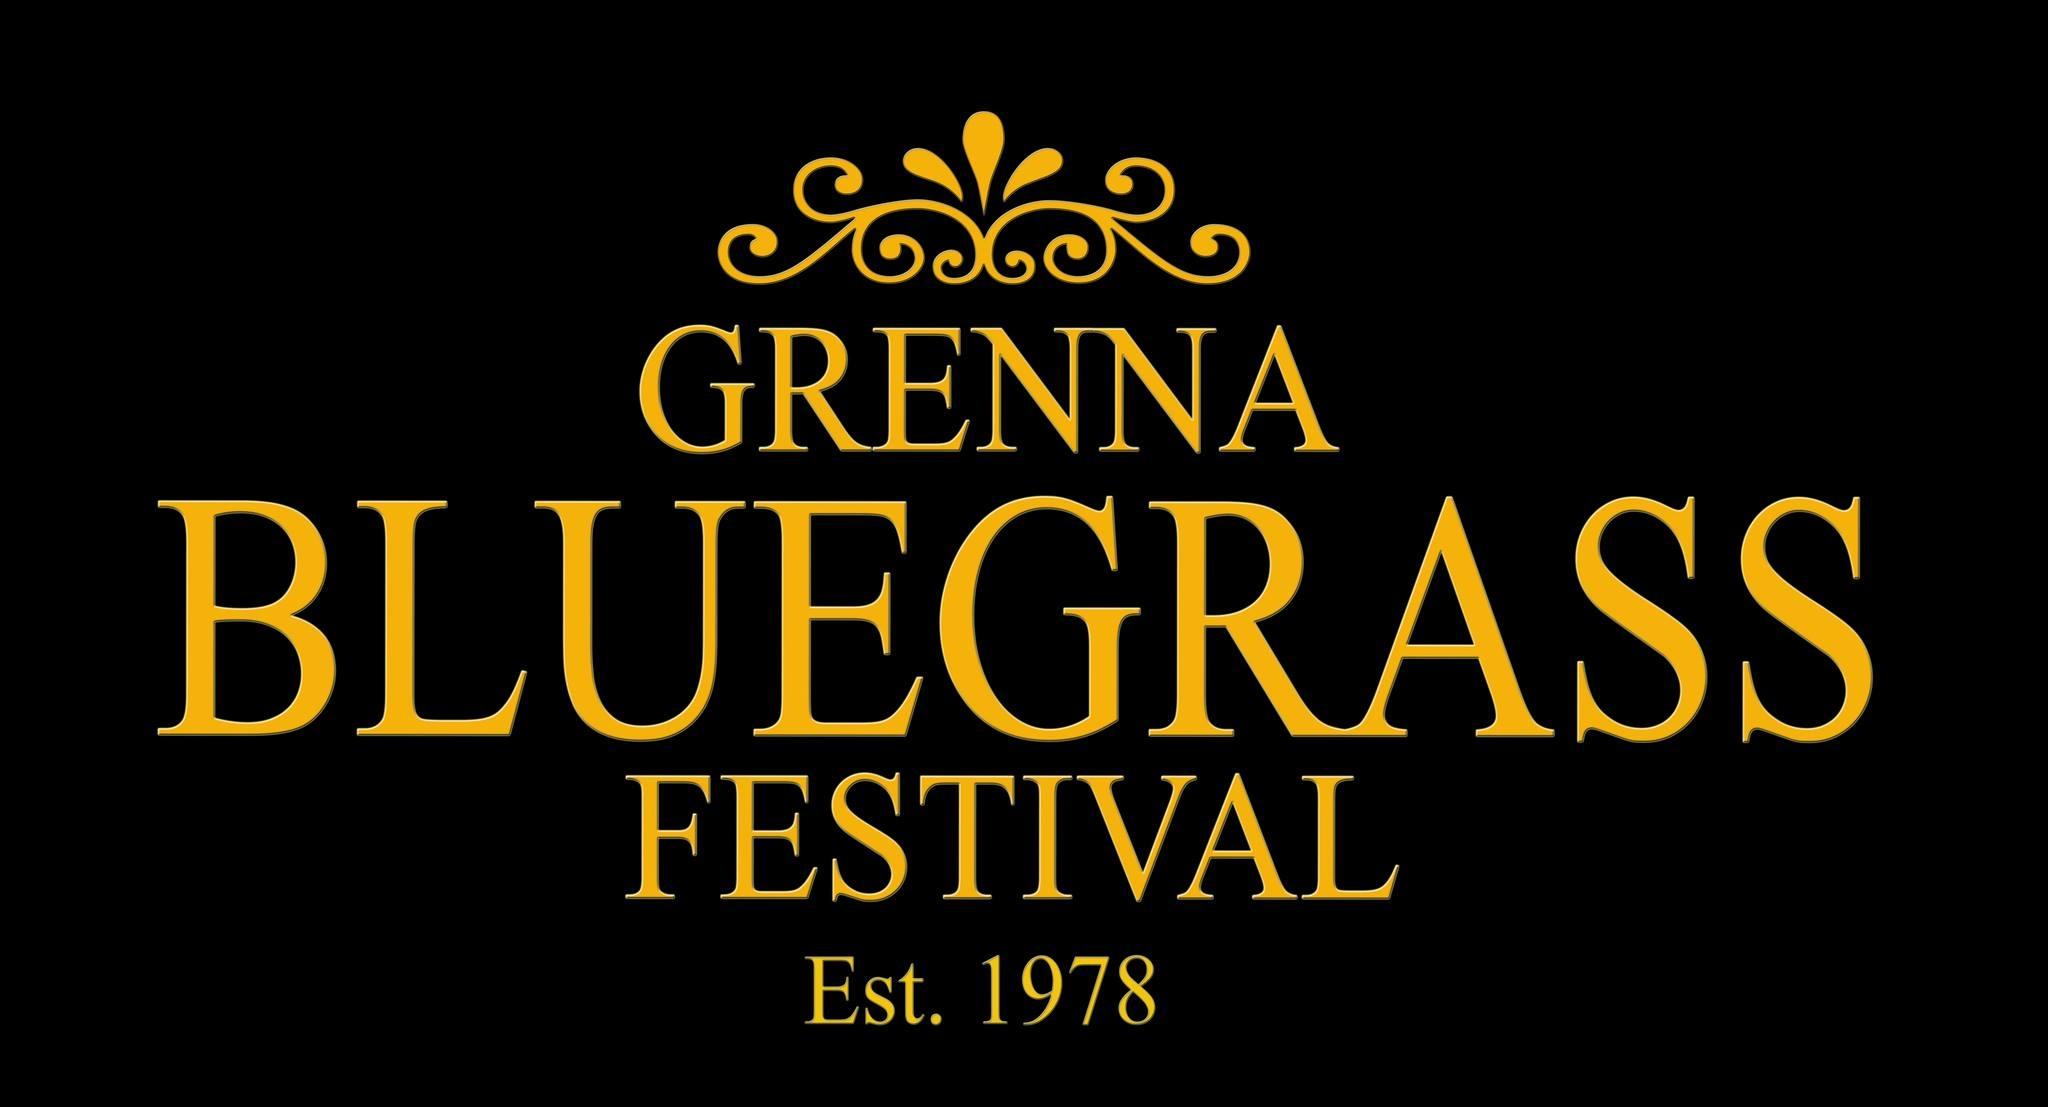 Grenna_bluegrass_festival_2014-06-29_17-29